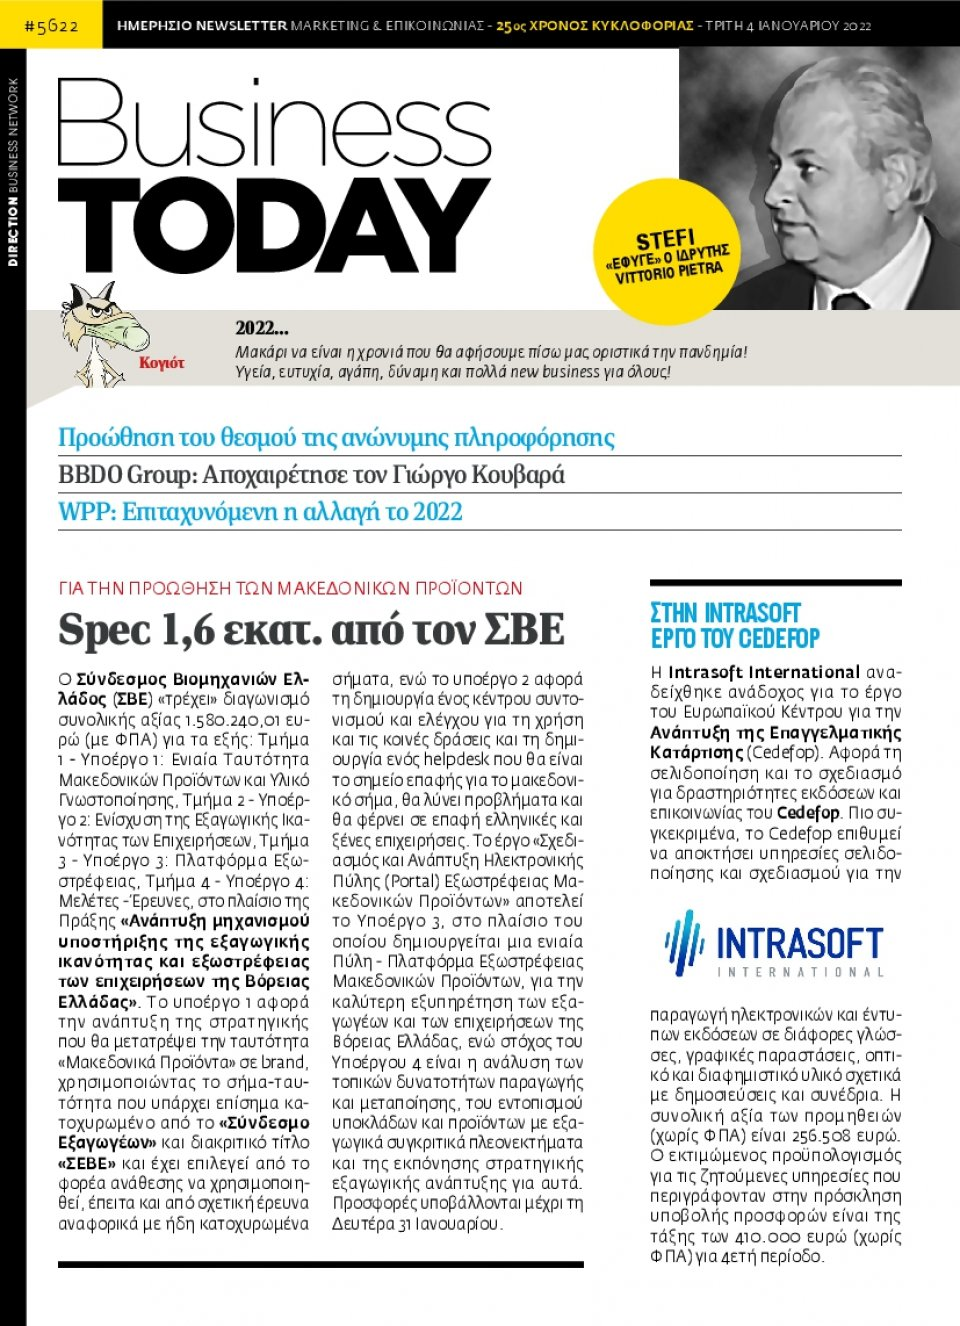 1d7974c16f9 Bloomberg: Από το επόμενο έτος η μεταφορά φυσικού αερίου, μέσω του ...